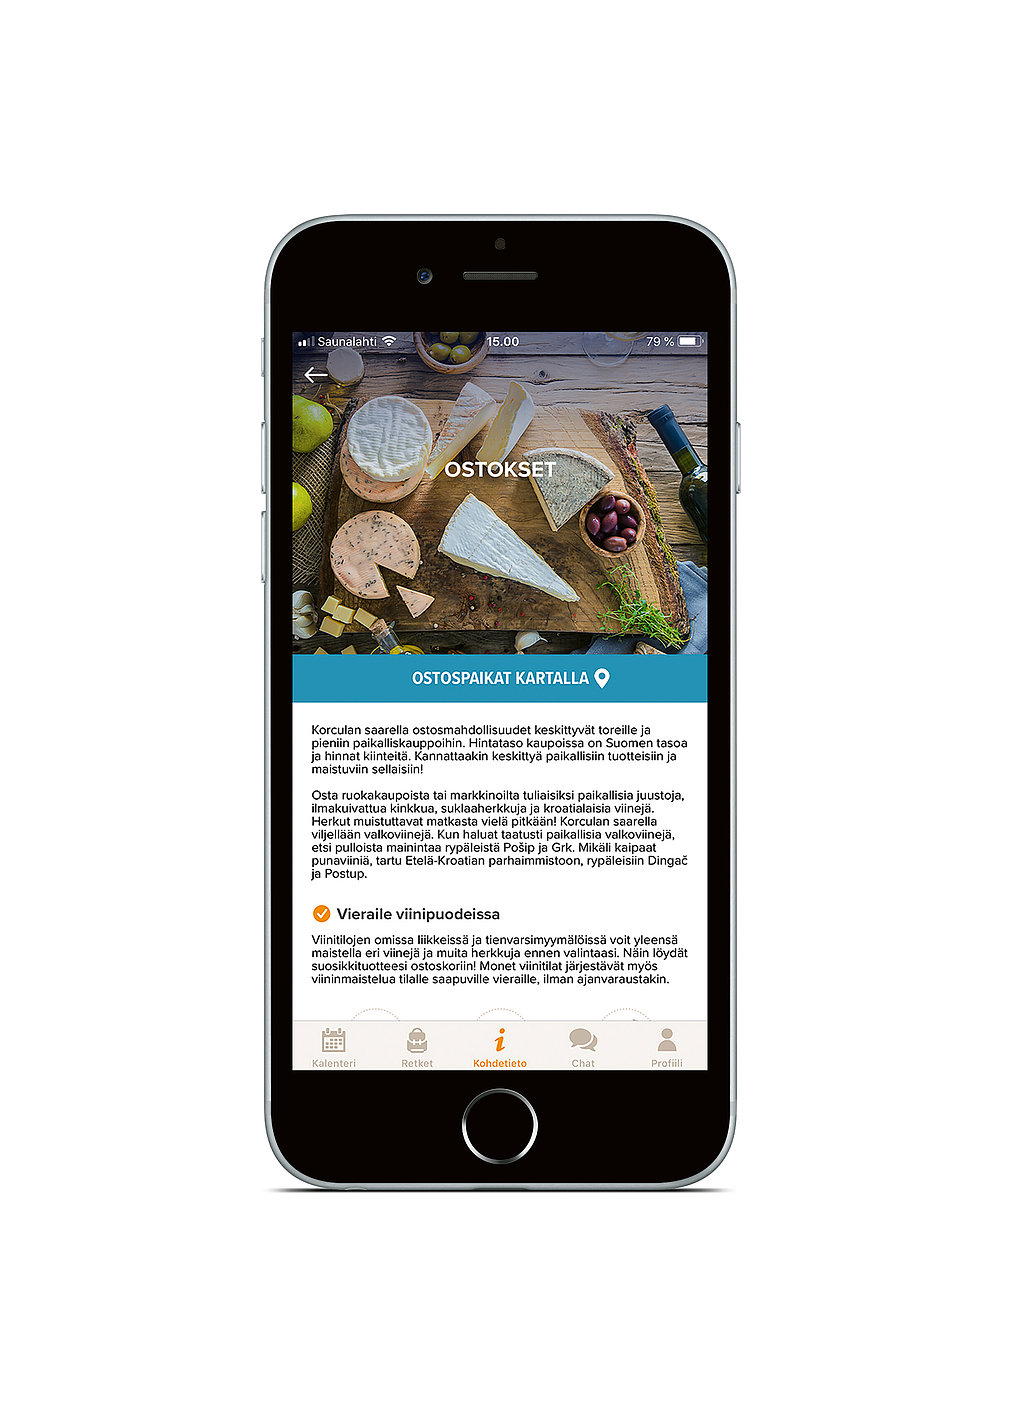 Suntours App – A Guide Always at Hand | Red Dot Design Award